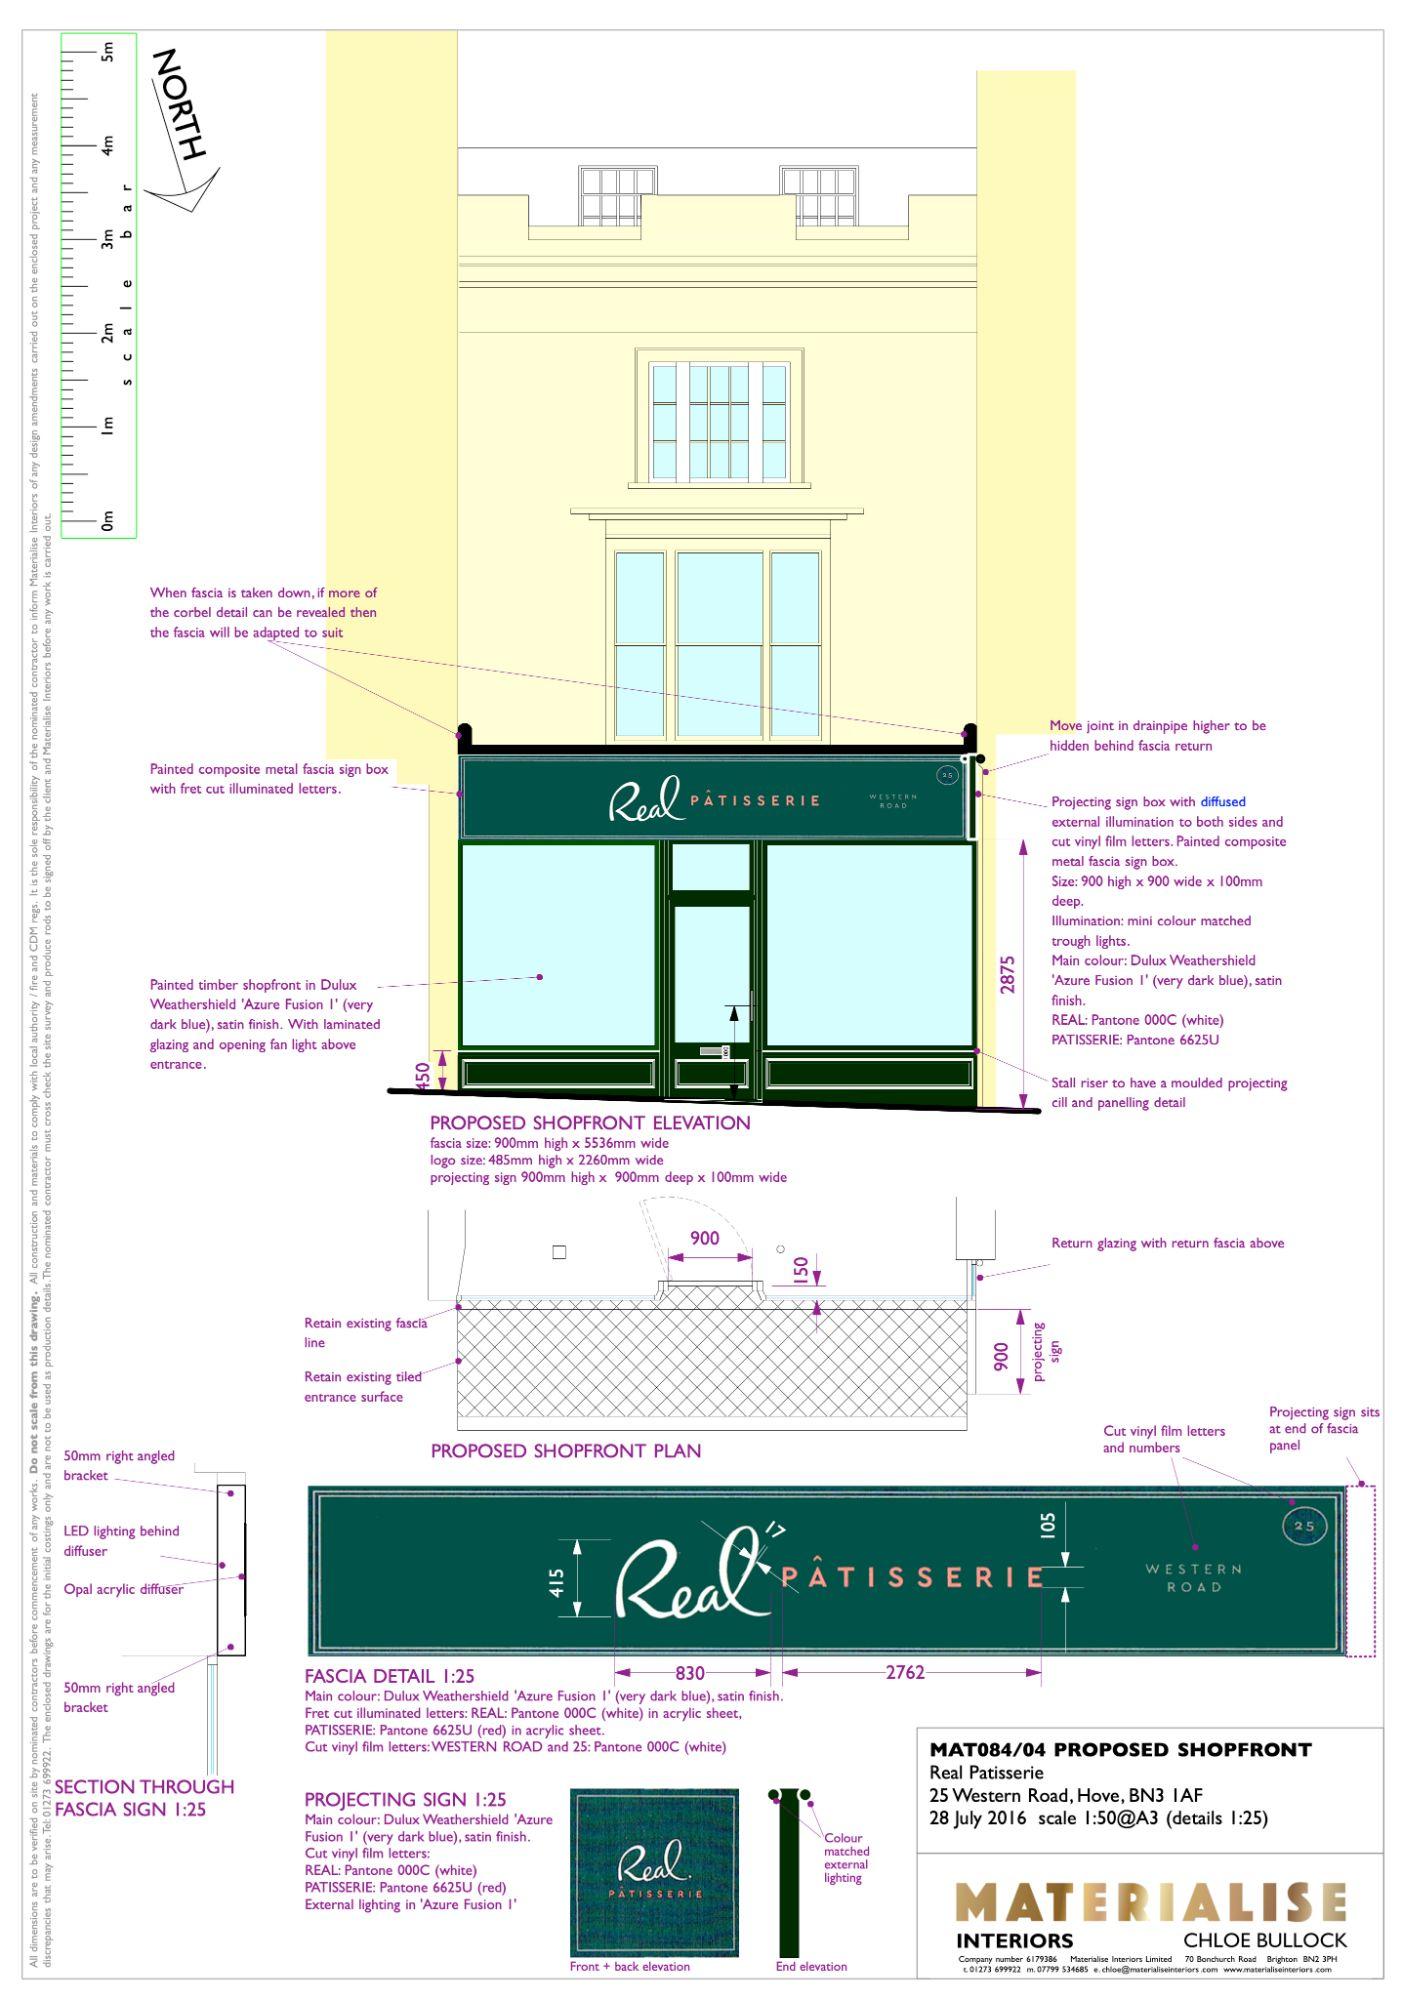 Shopfront drawing